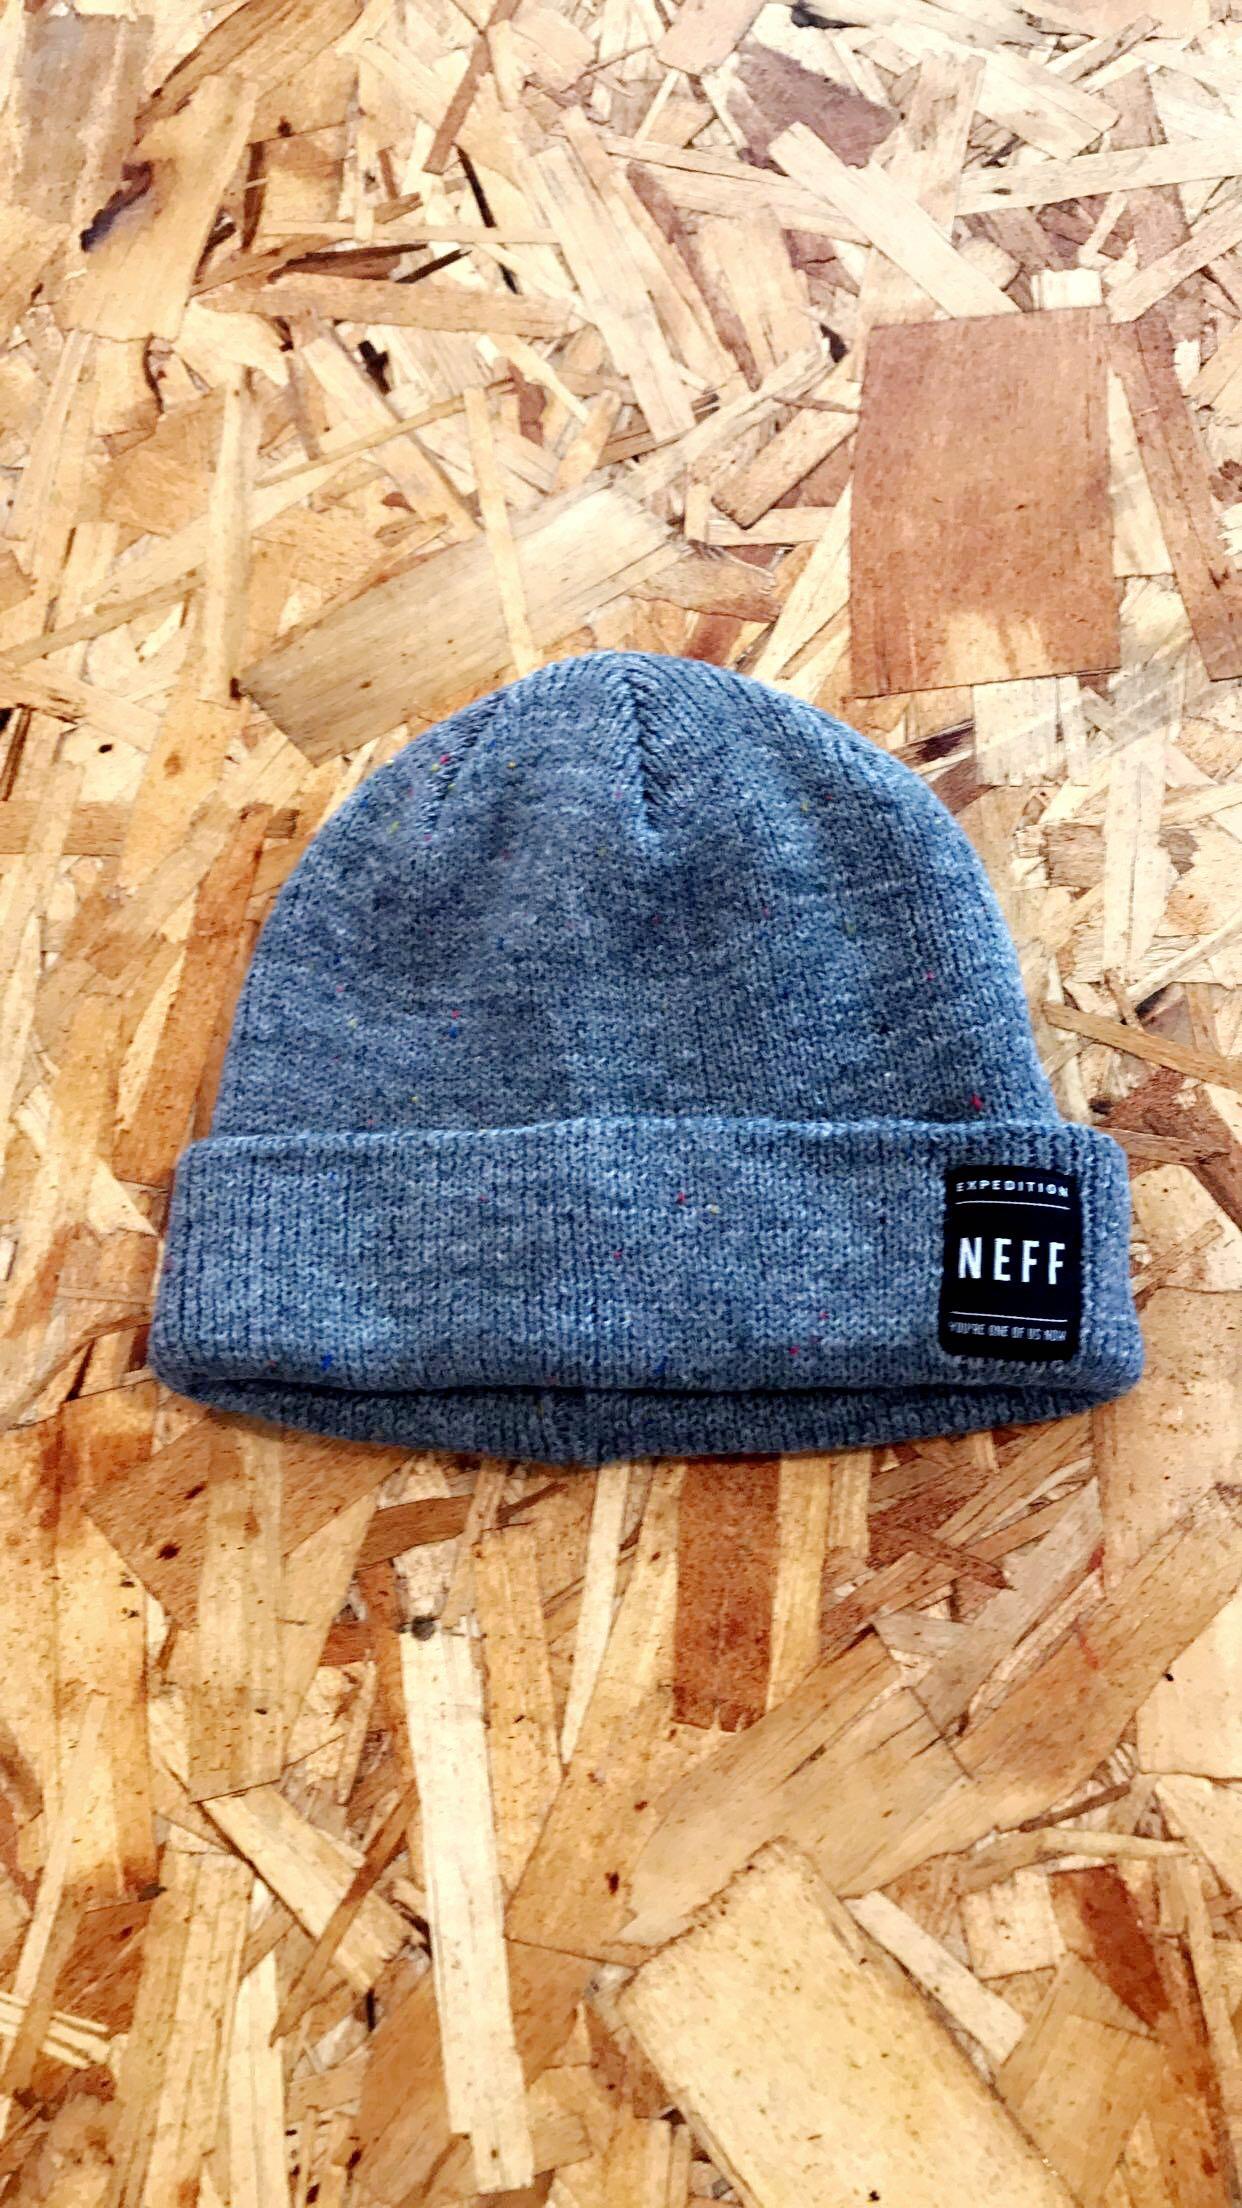 ee9a7535c71 Neff Beanie - Grey — Free Culture Clothing